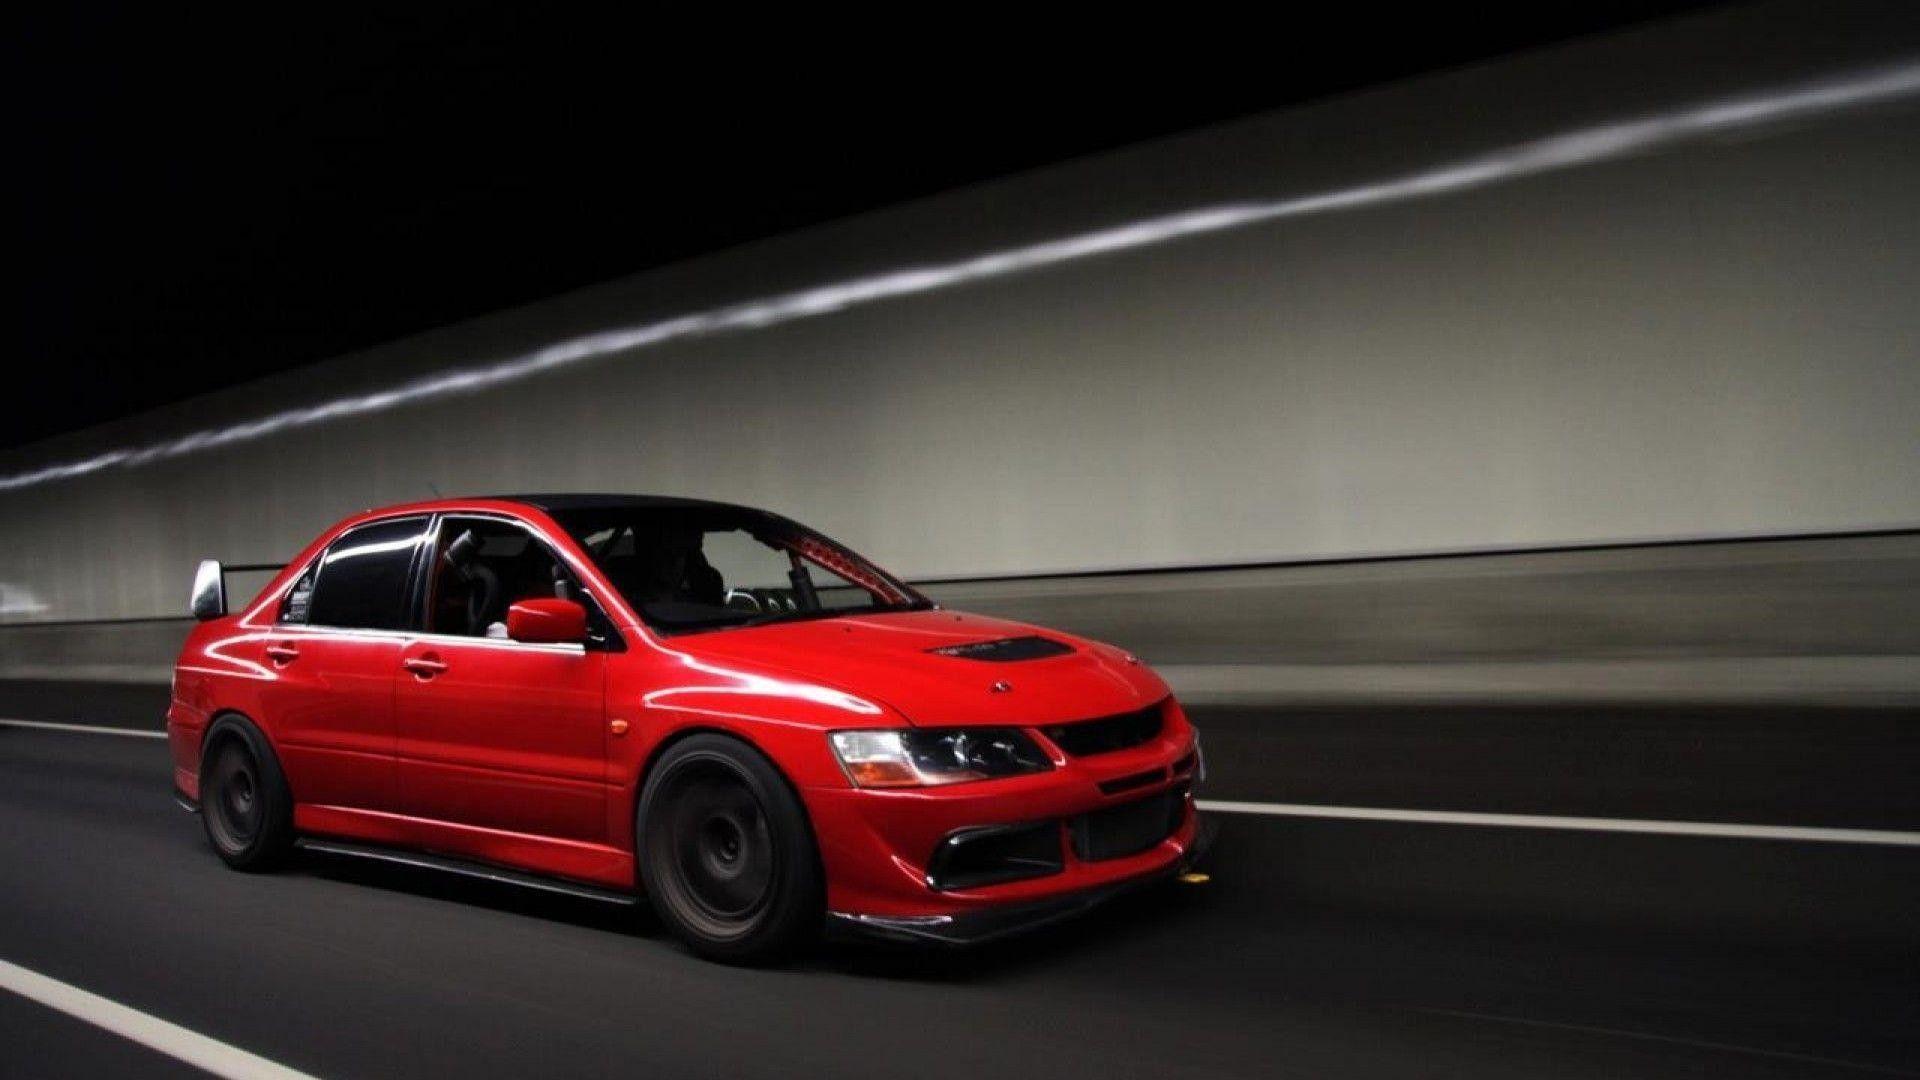 Mitsubishi Evolution Wallpapers Top Free Mitsubishi Evolution Backgrounds Wallpaperaccess